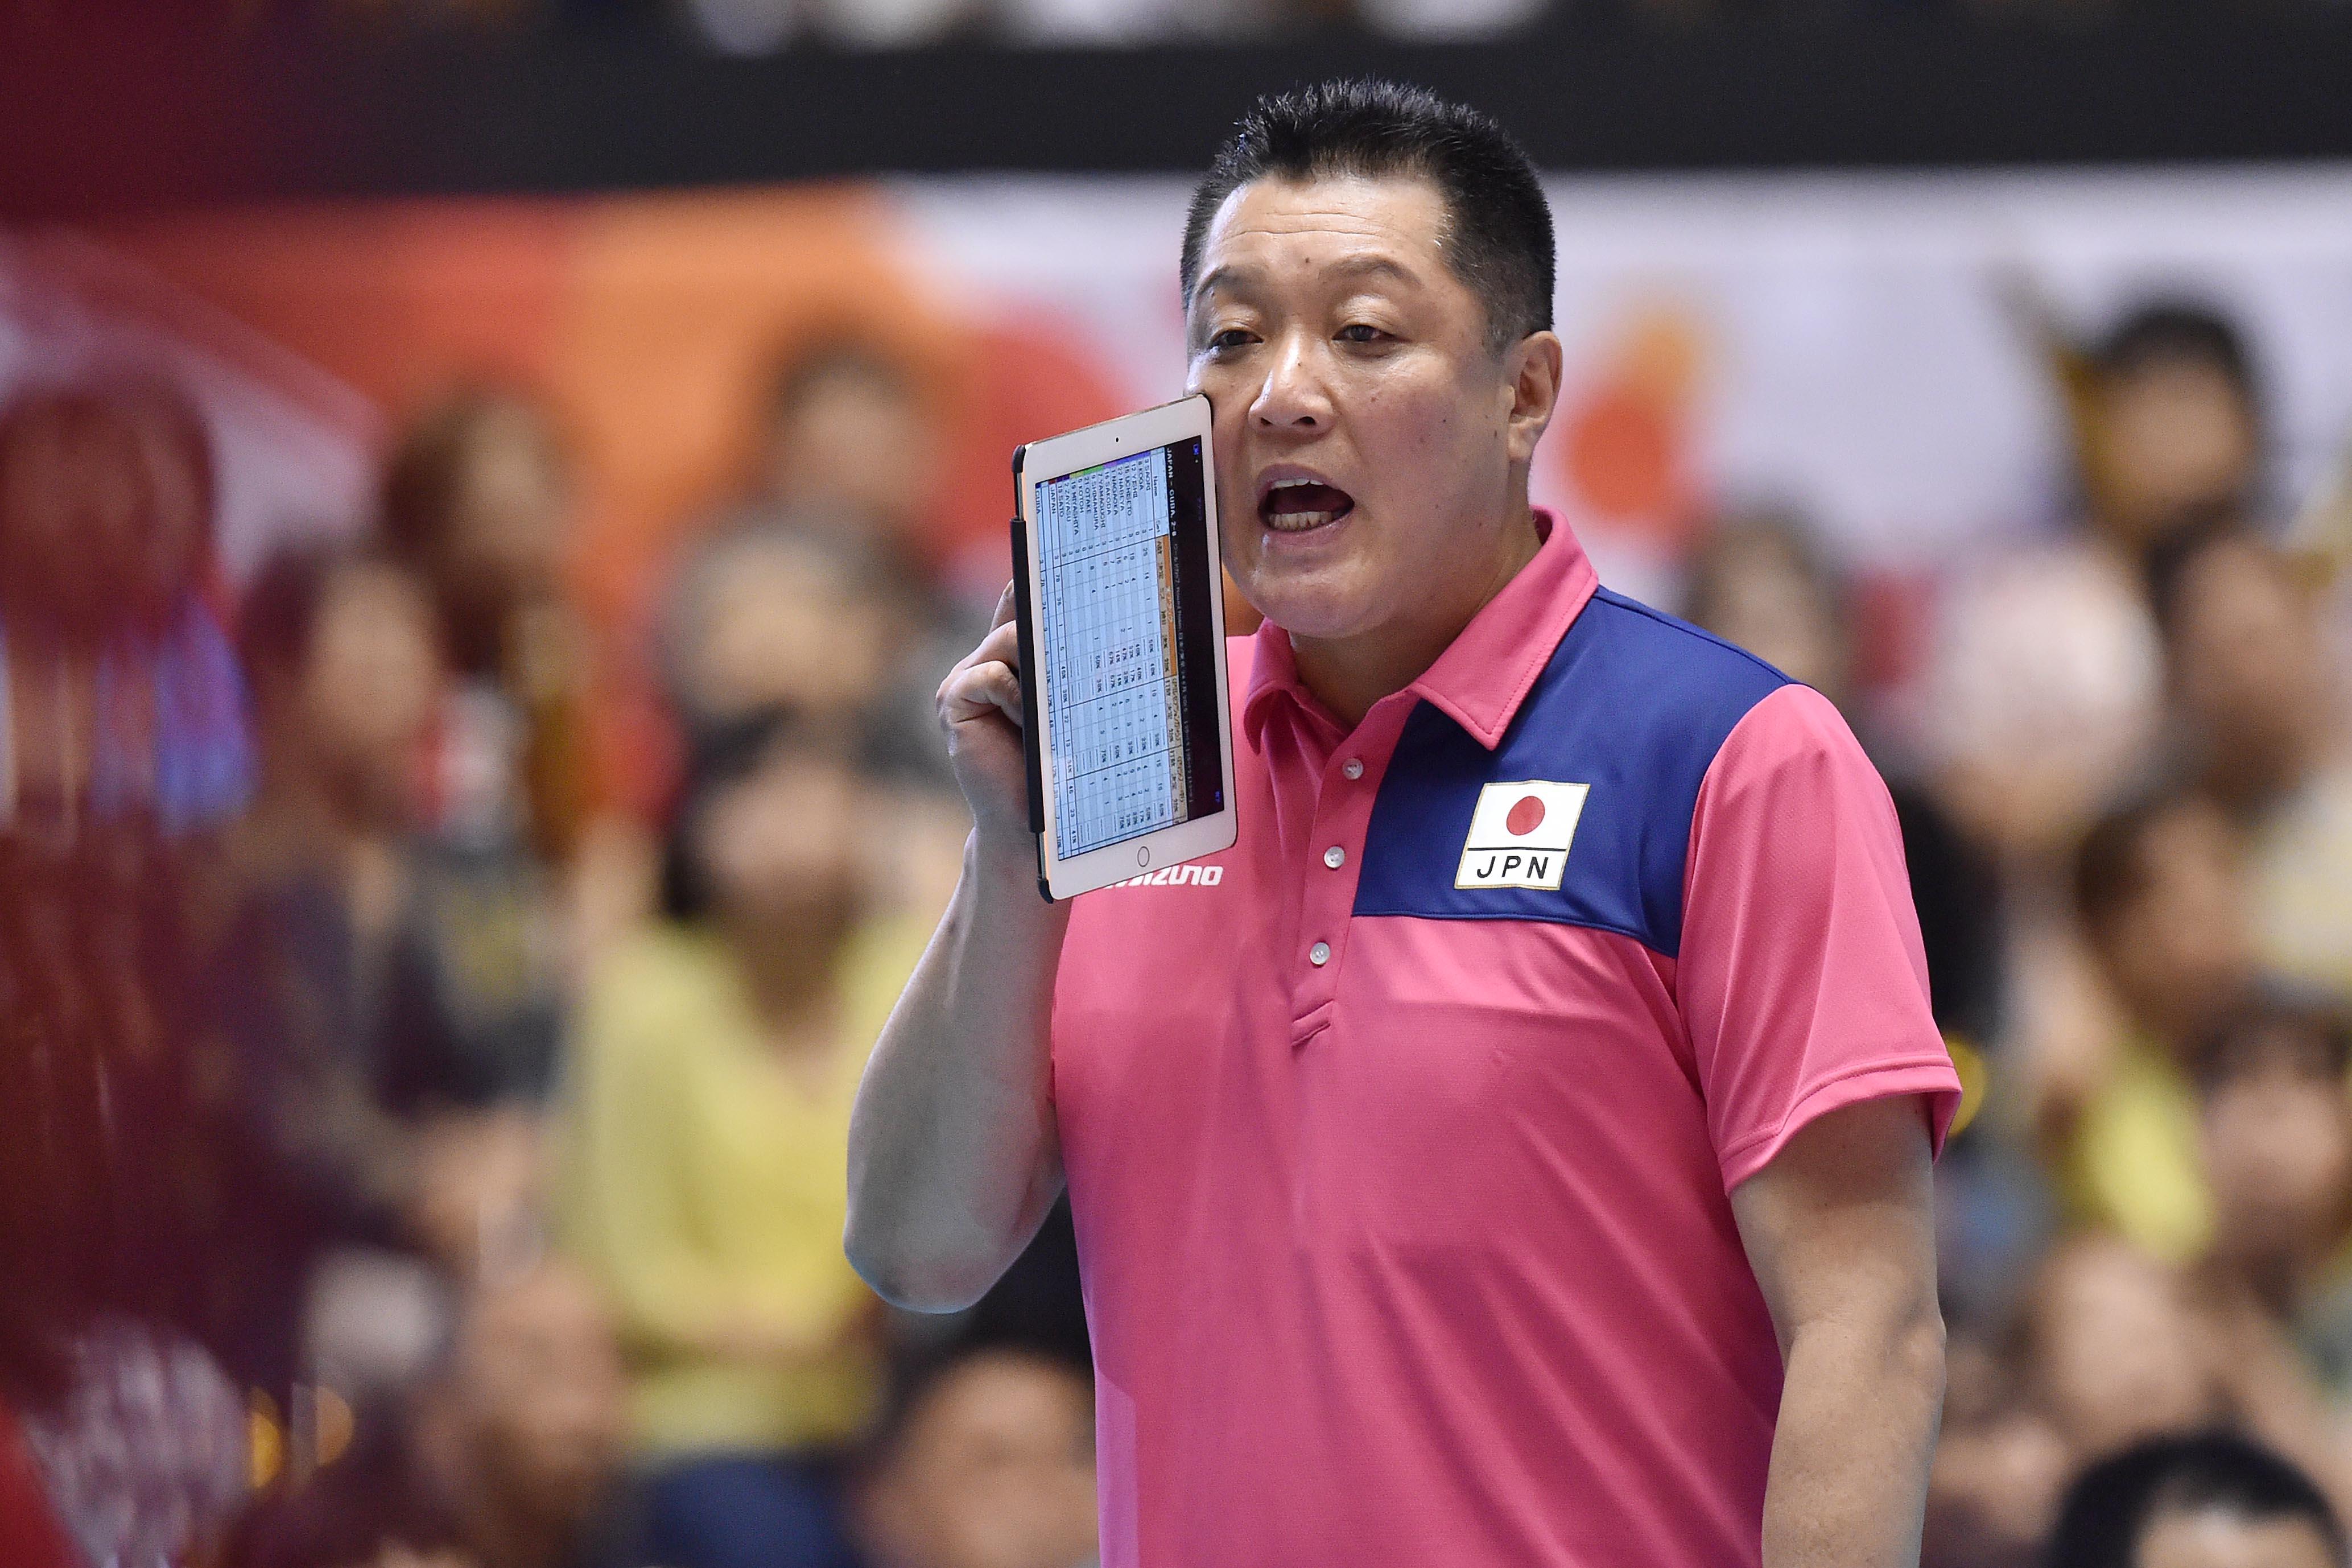 Japan Head Coach - Masayoshi Manabe